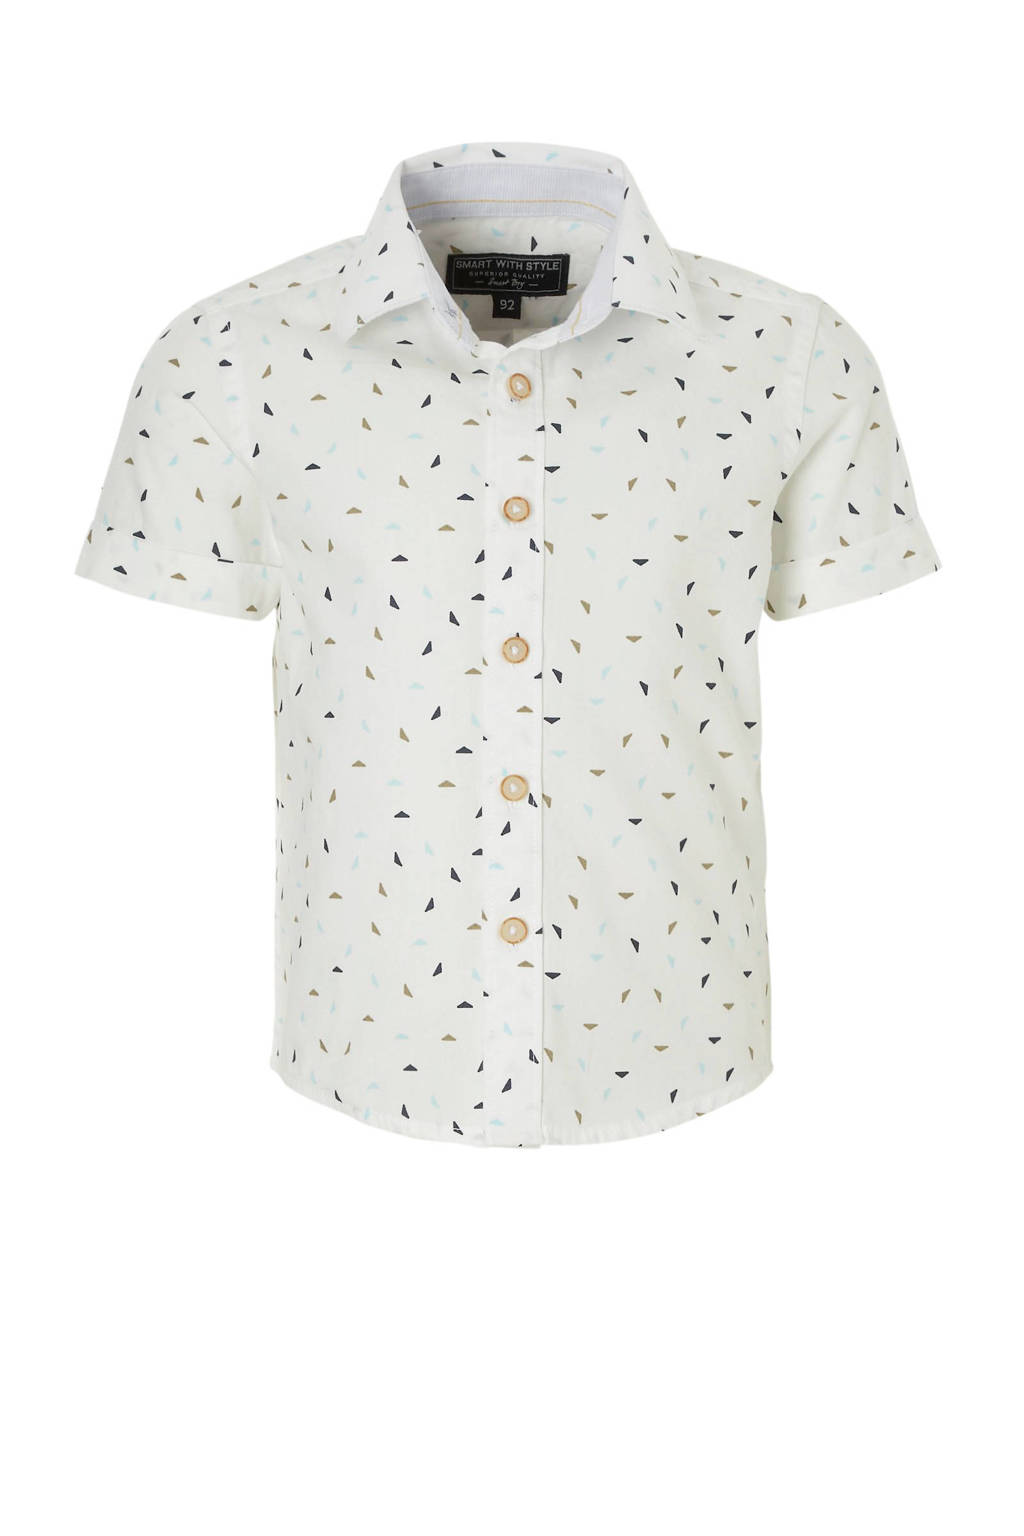 C&A Palomino overhemd met all over print ecru, Ecru